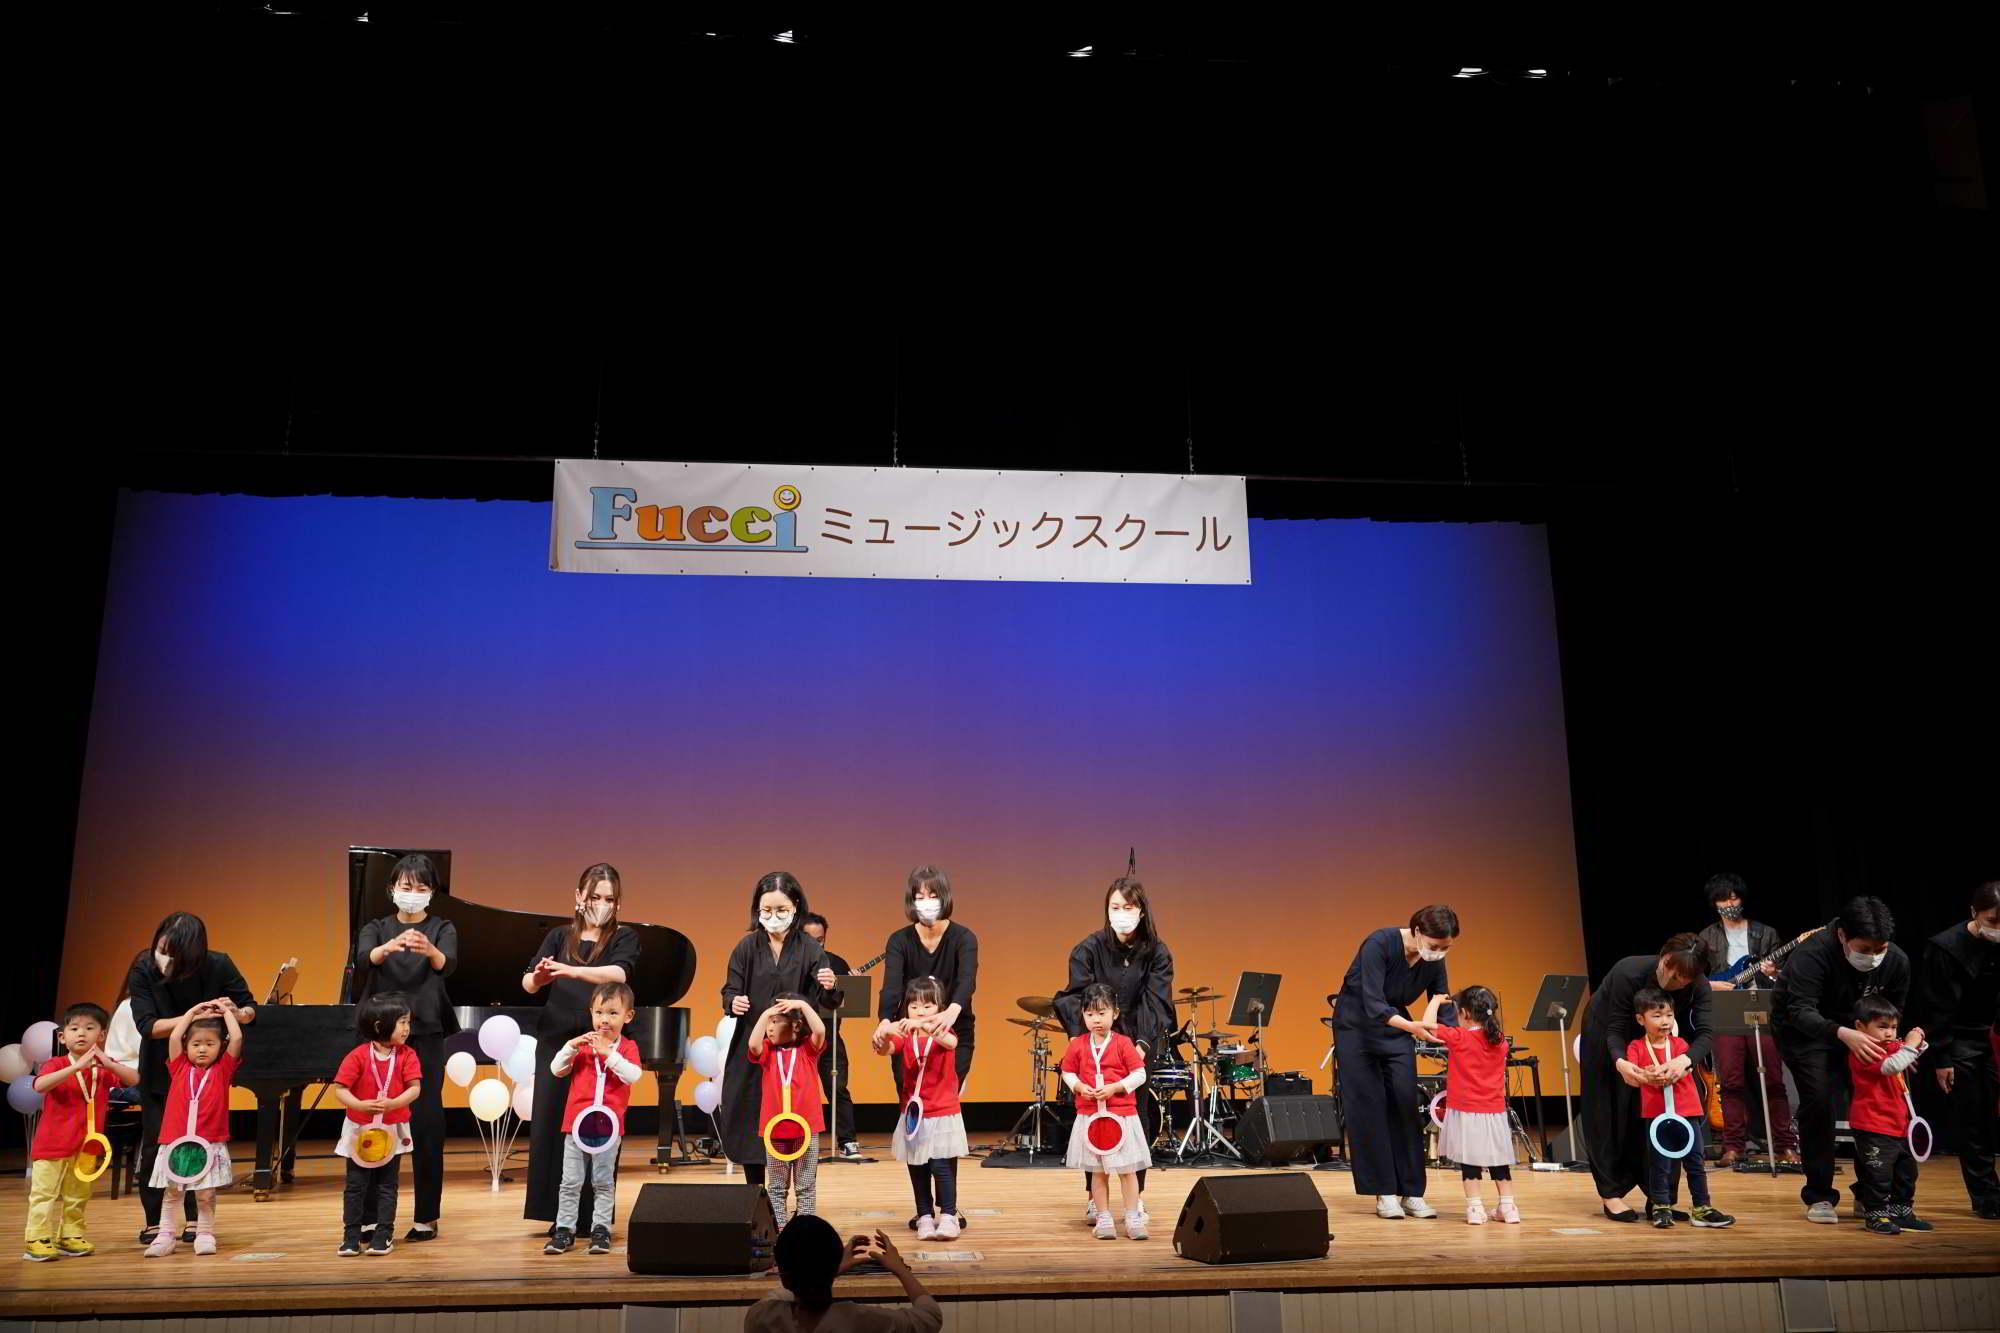 Fucci発表会ライブ2021リトミック